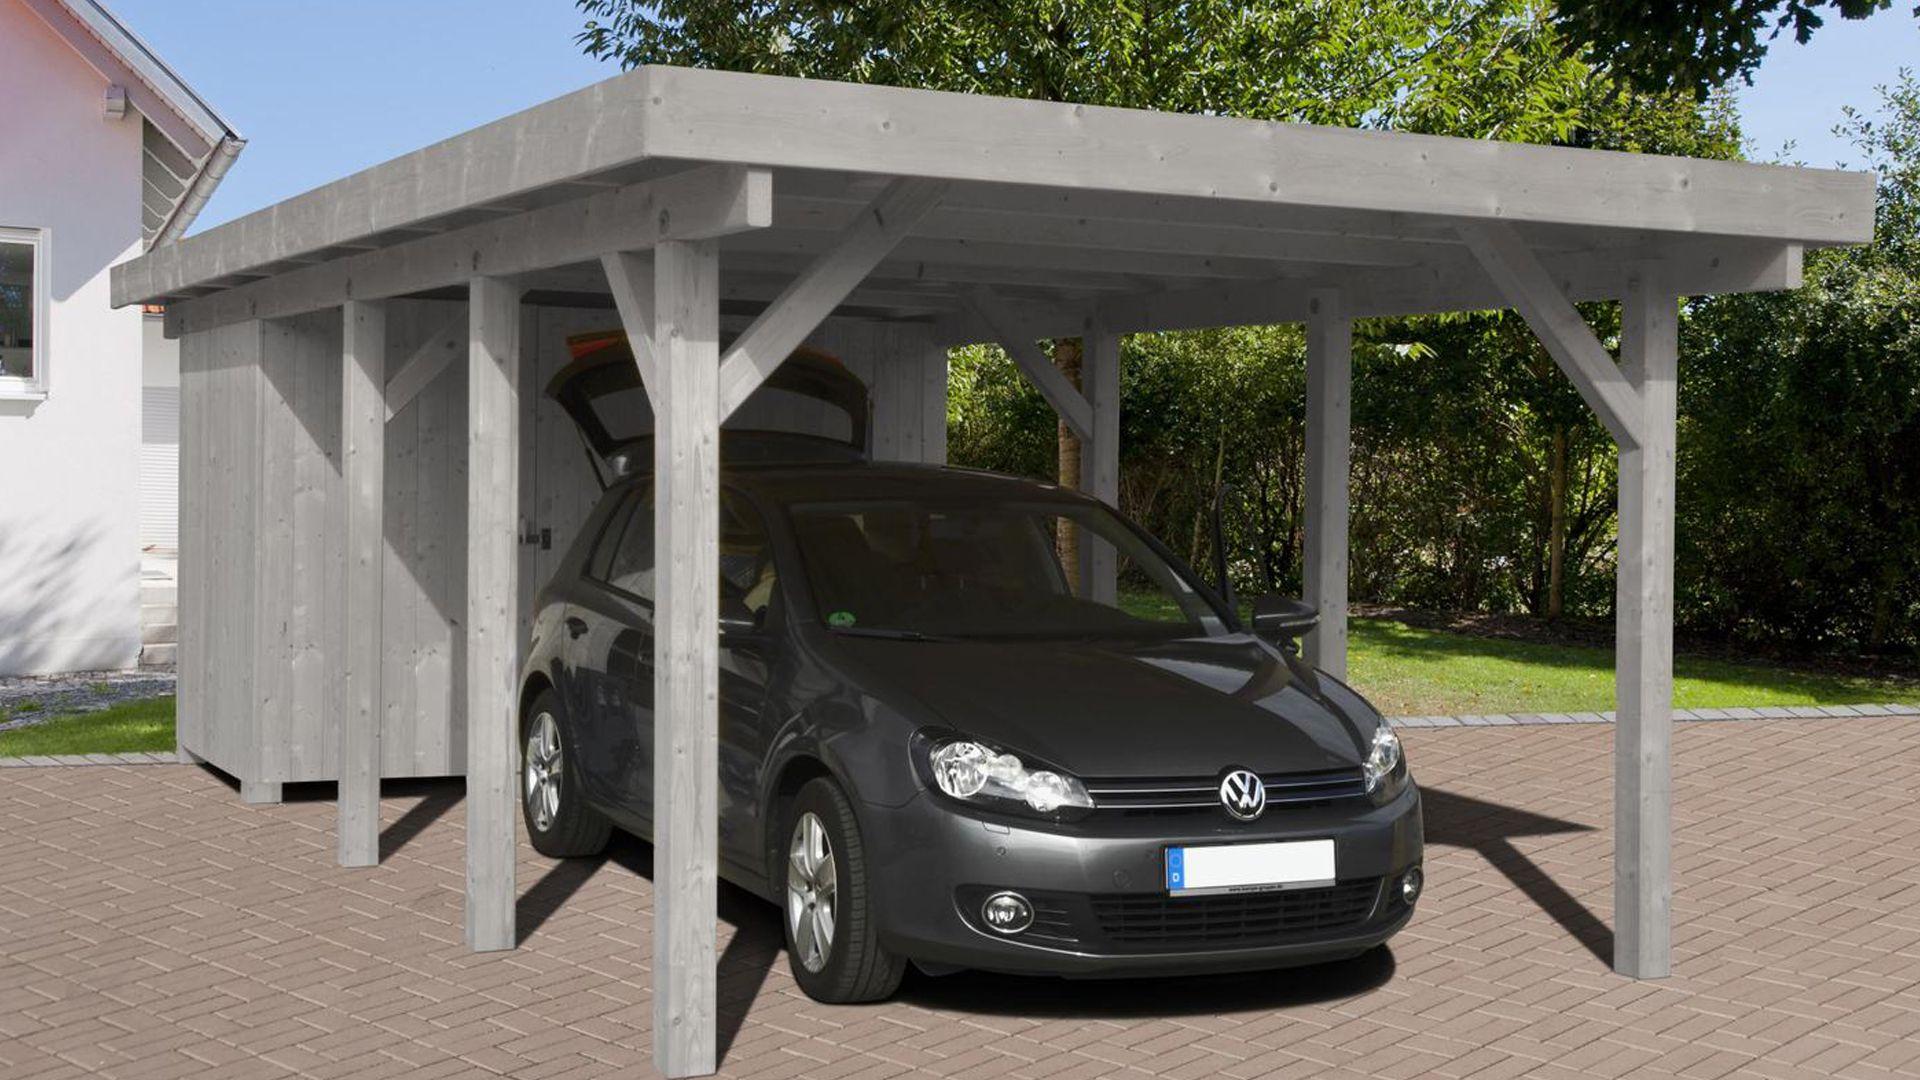 einzelcarport 882191 360 x 760cm silbergrau mit aluminium dachplatten. Black Bedroom Furniture Sets. Home Design Ideas